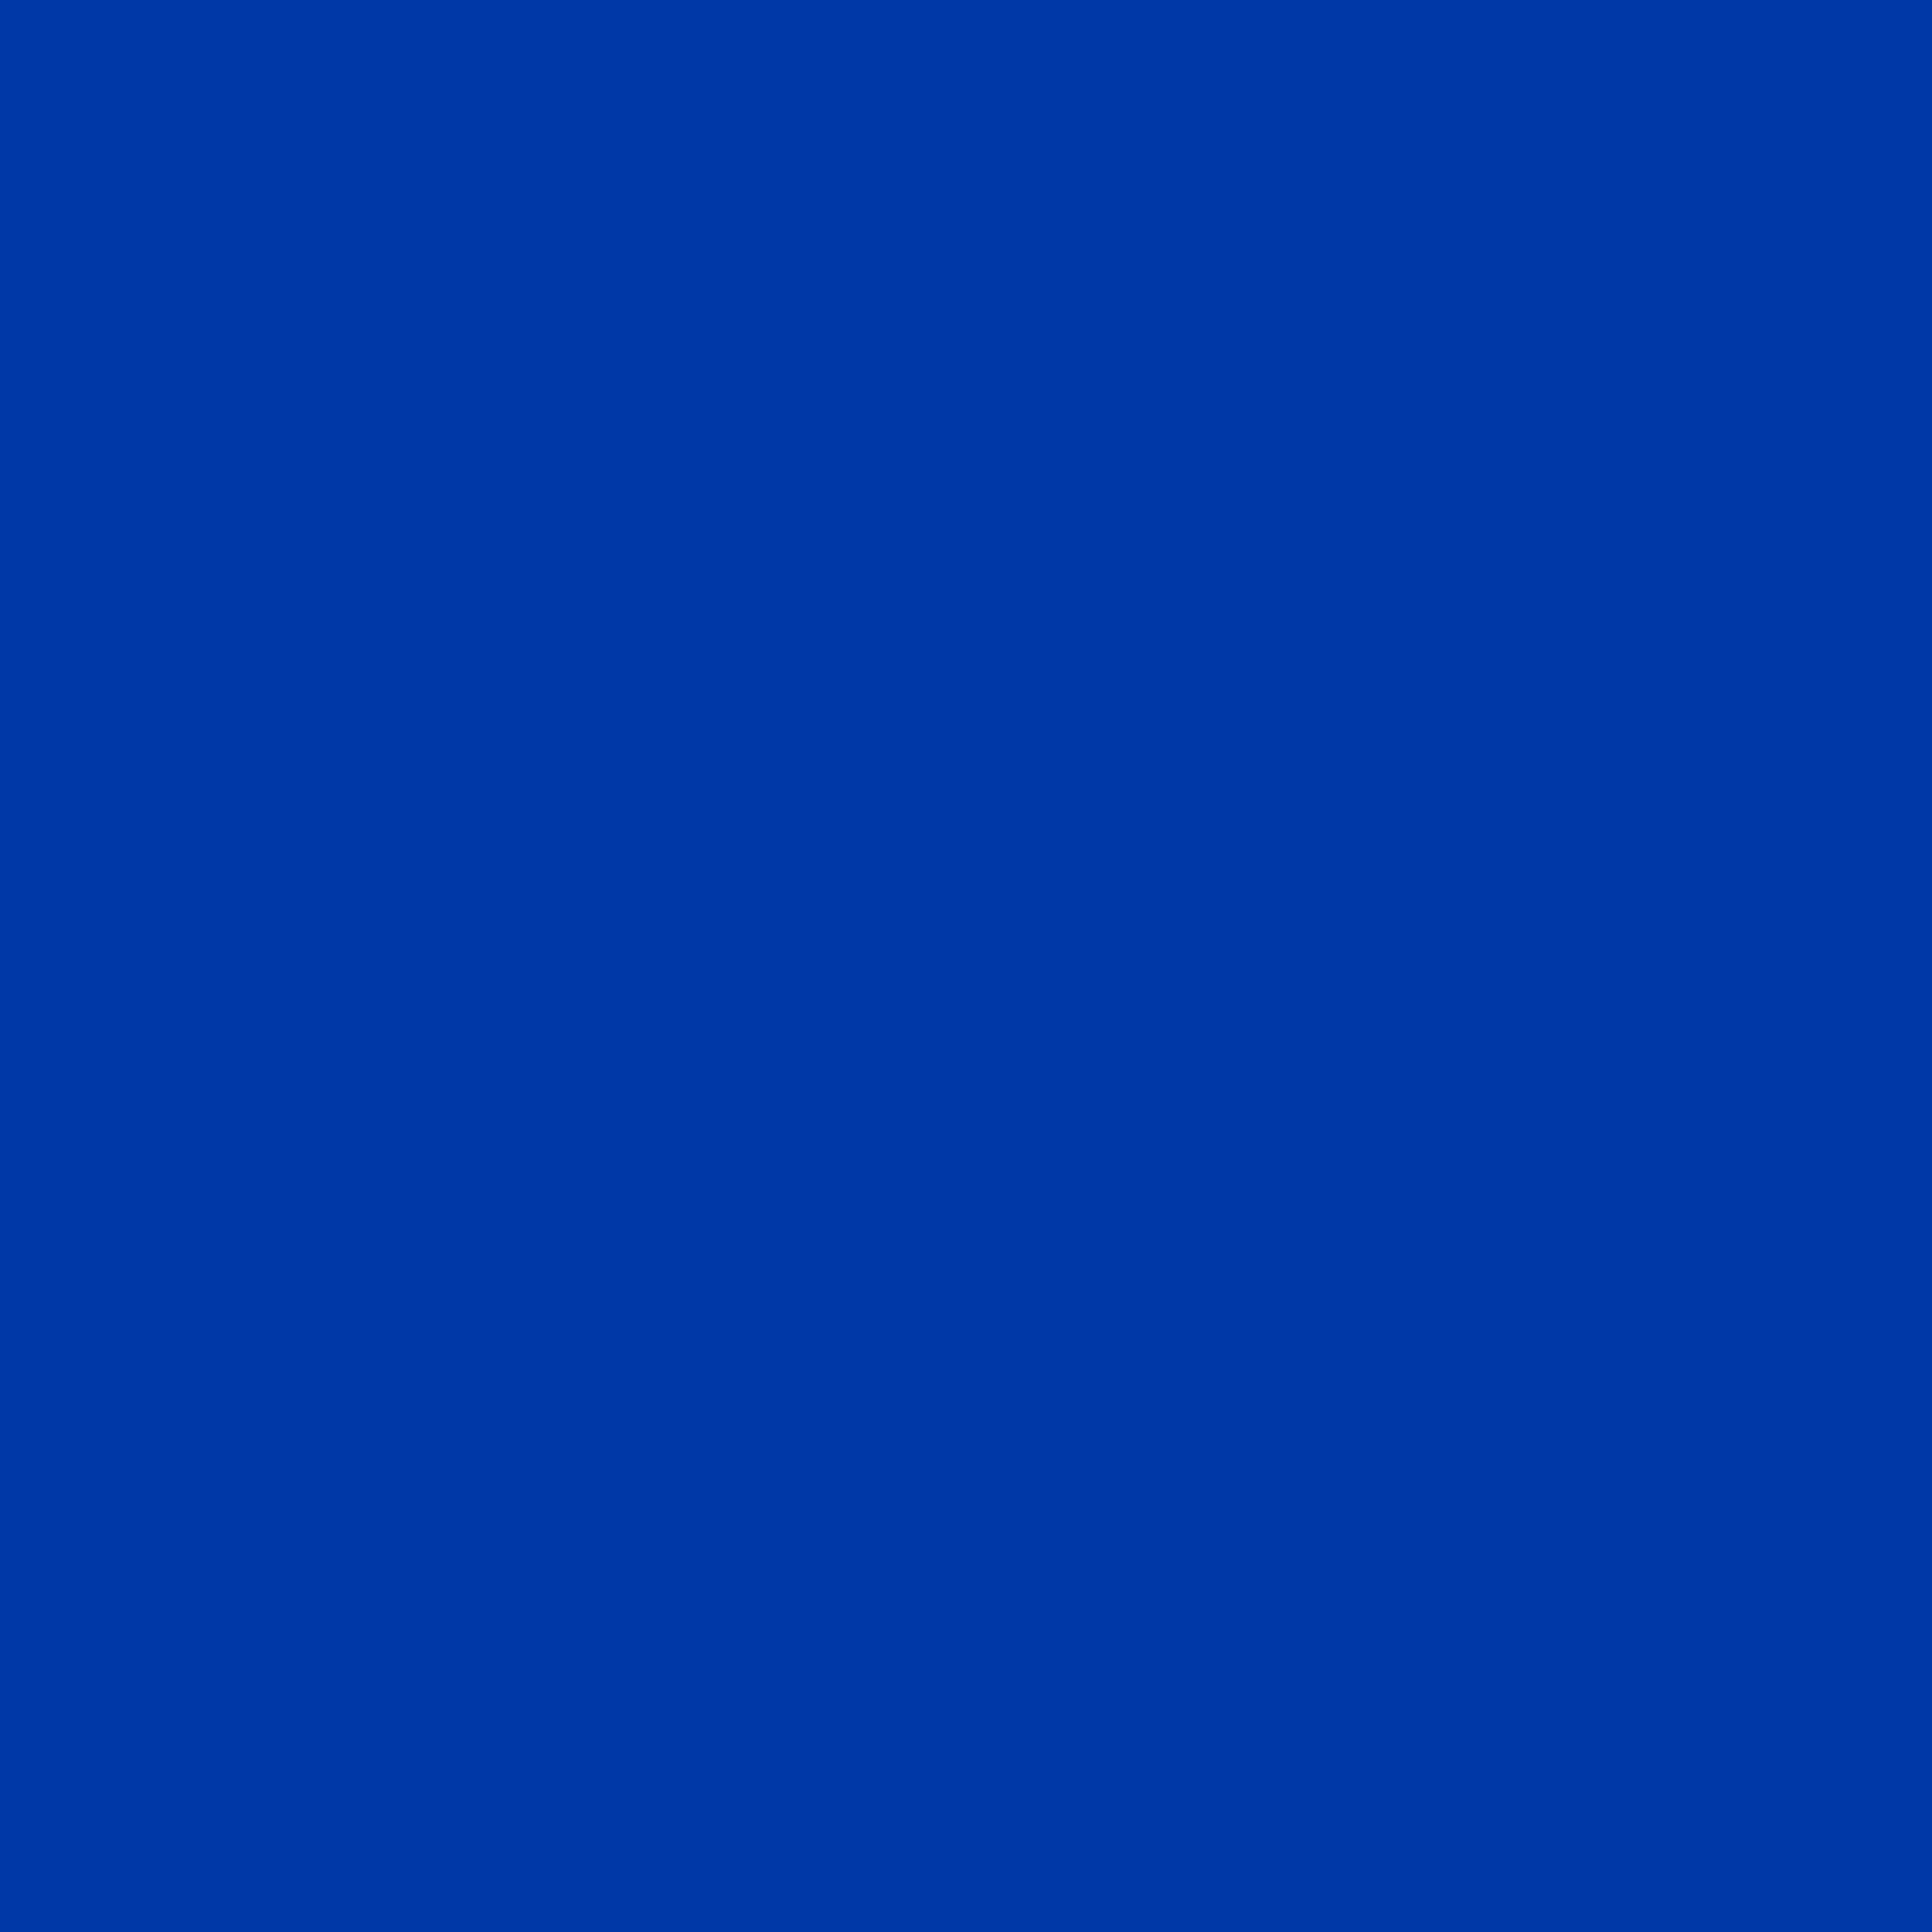 2048x2048 Royal Azure Solid Color Background